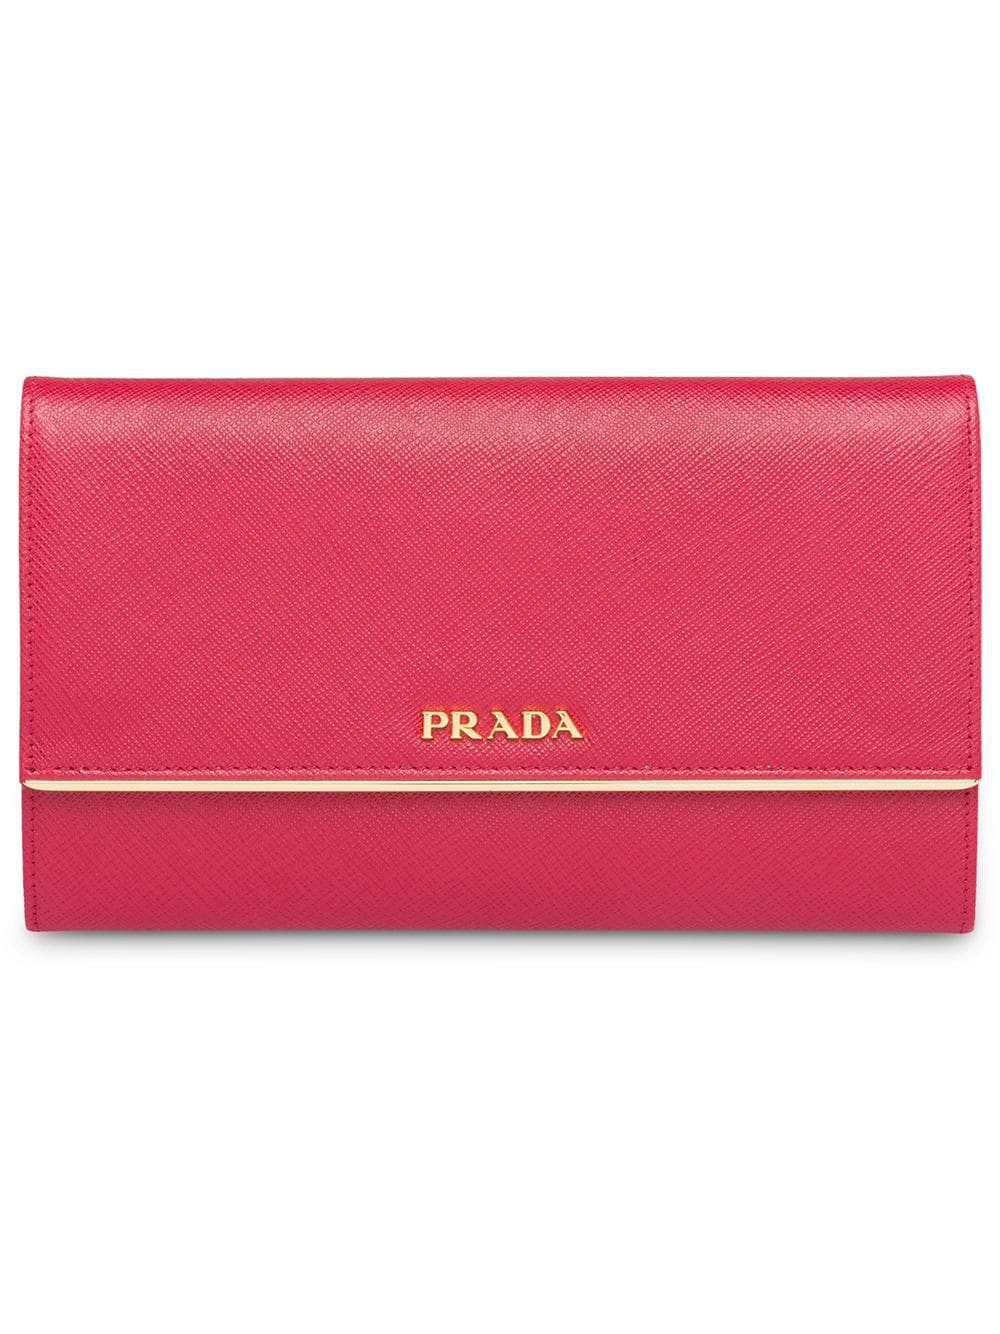 f340d7099edb1 Prada Portemonnaie Aus Saffiano-Leder - Rot In Black